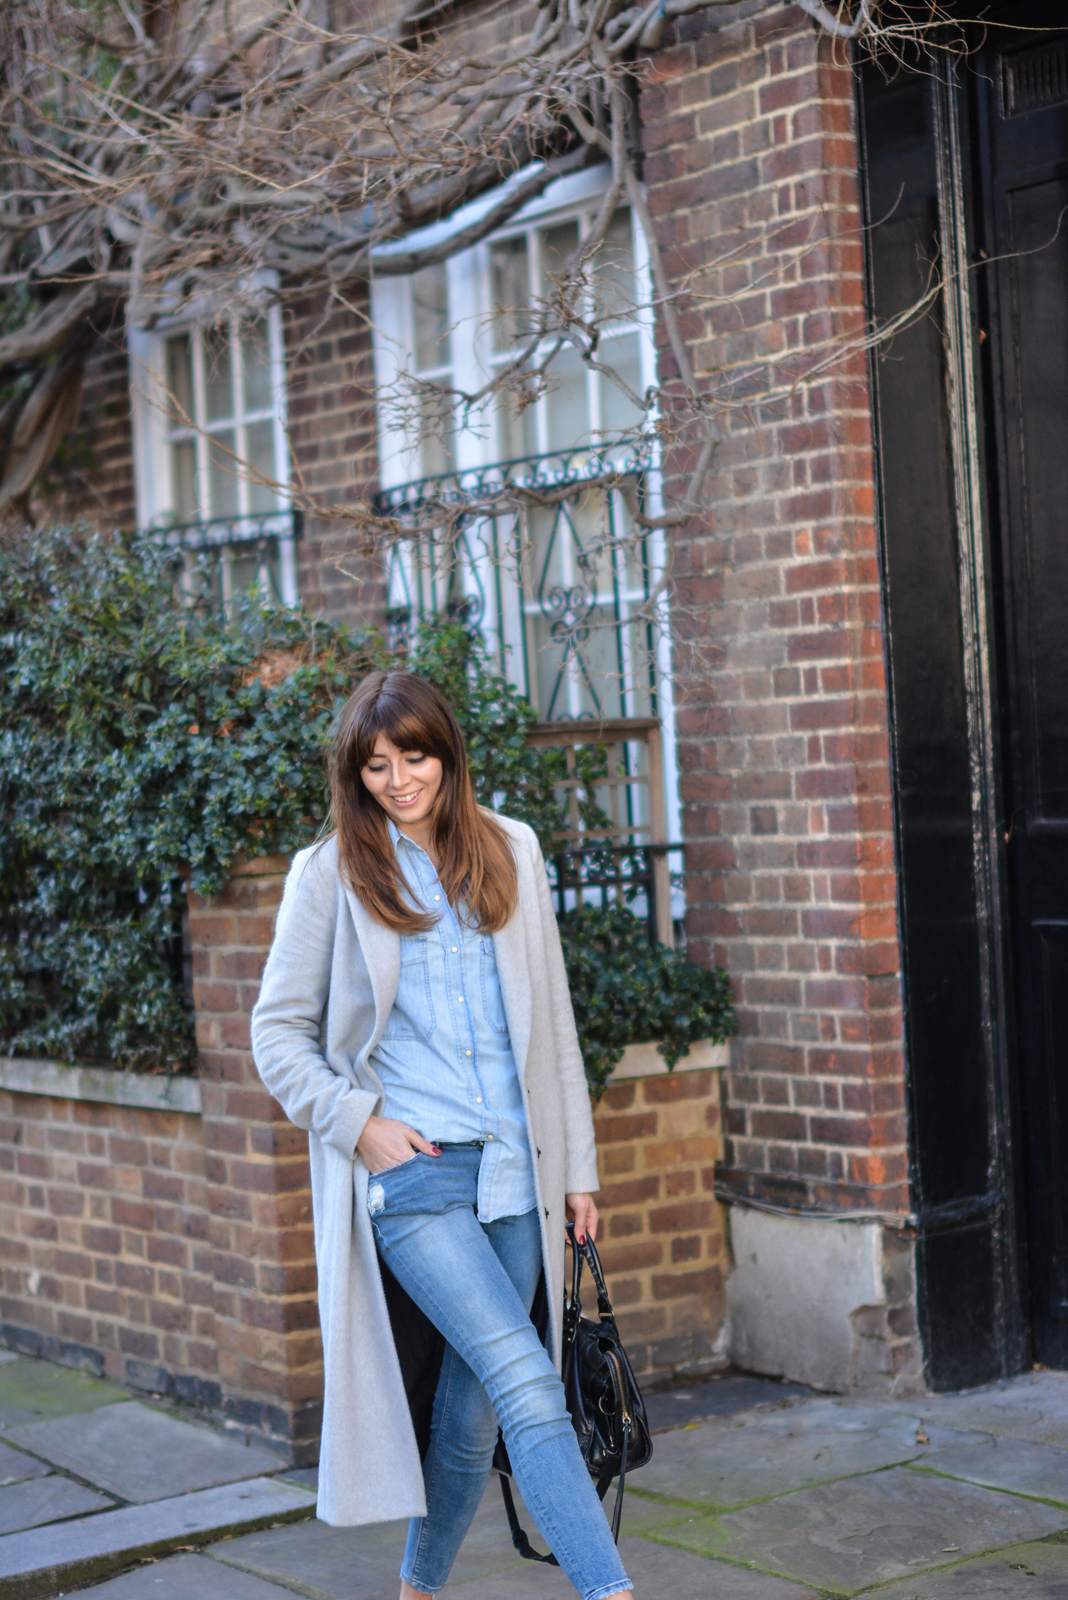 EJSTYLE - Emma Hill, Fashion blogger, Dorothy Perkins Grey coat, zara denim shirt, asos skinny jeans, double denim trend, SS15